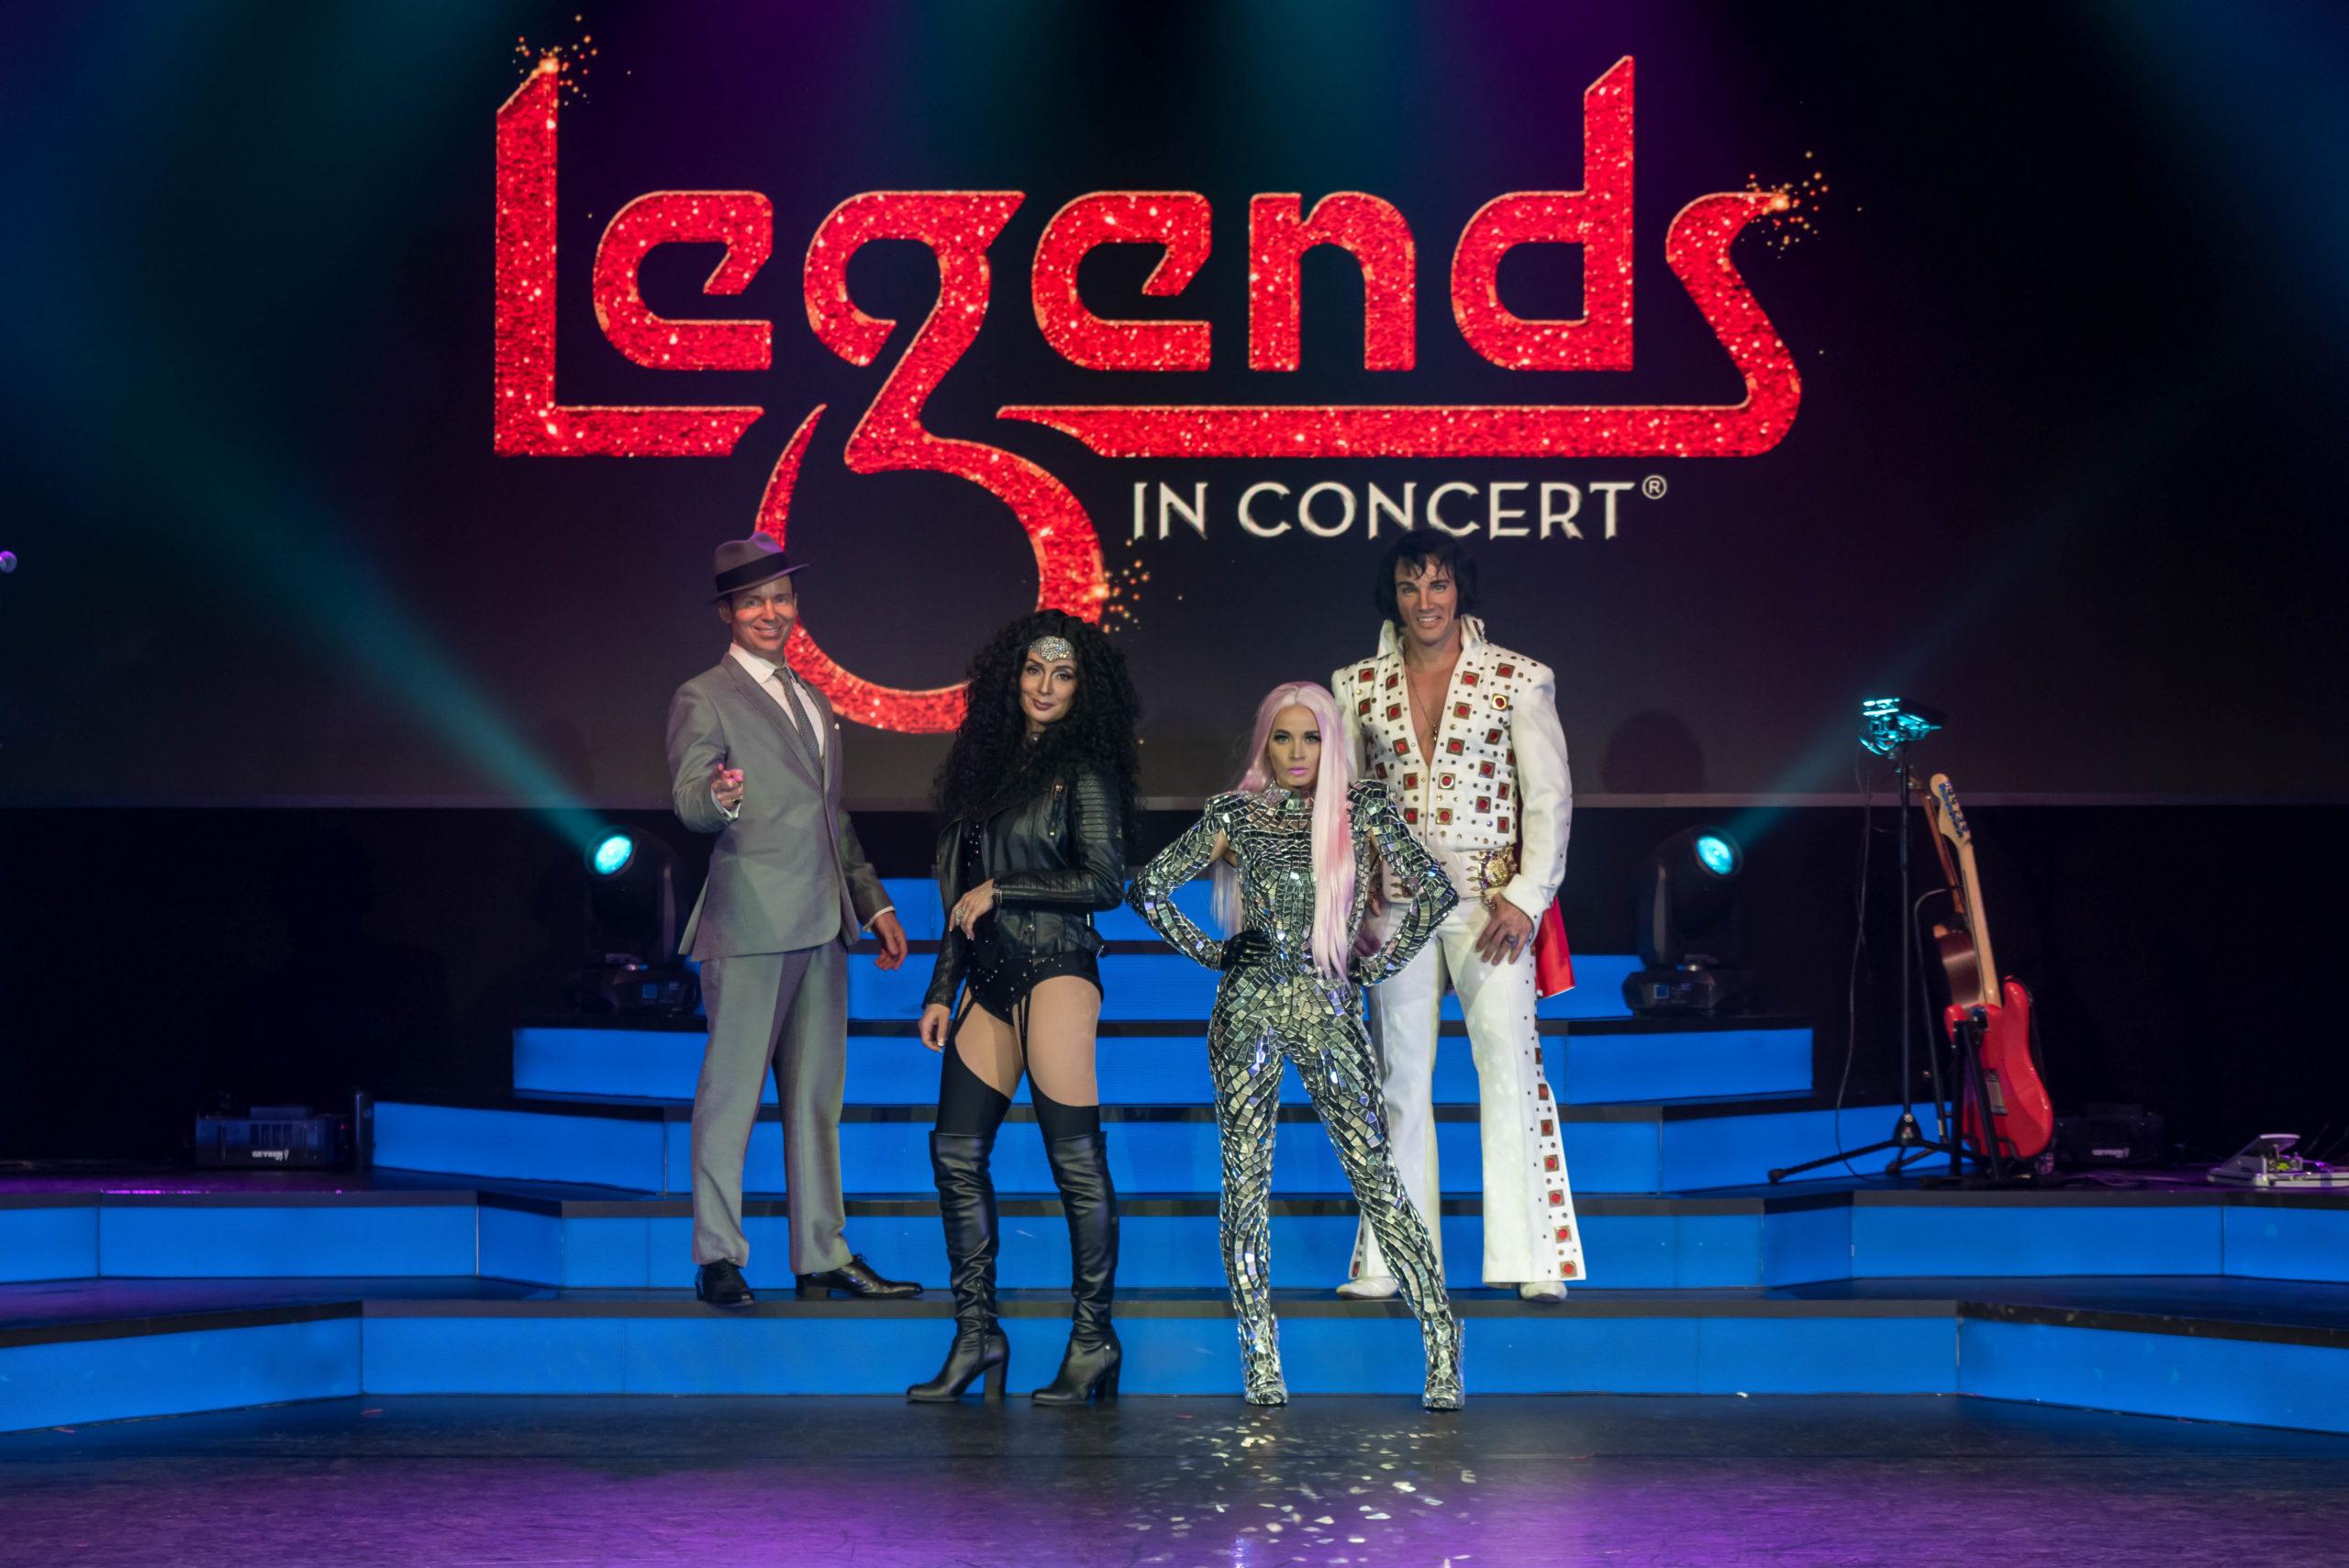 Legends In Concert Christmas Show 2021